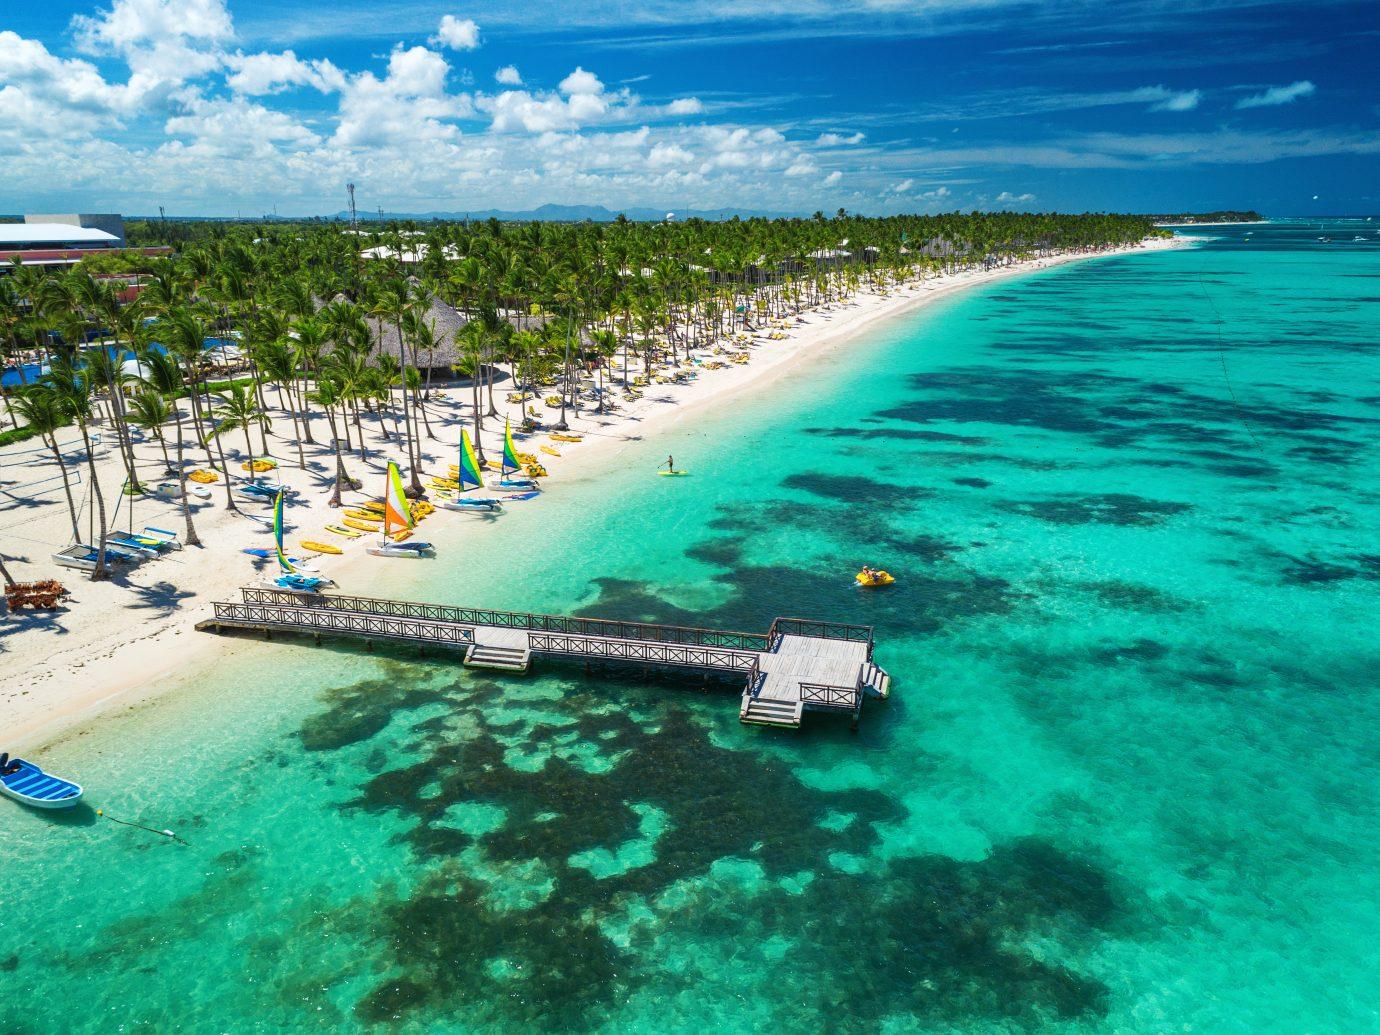 Aerial drone view of Caribbean resort Bavaro, Punta Cana